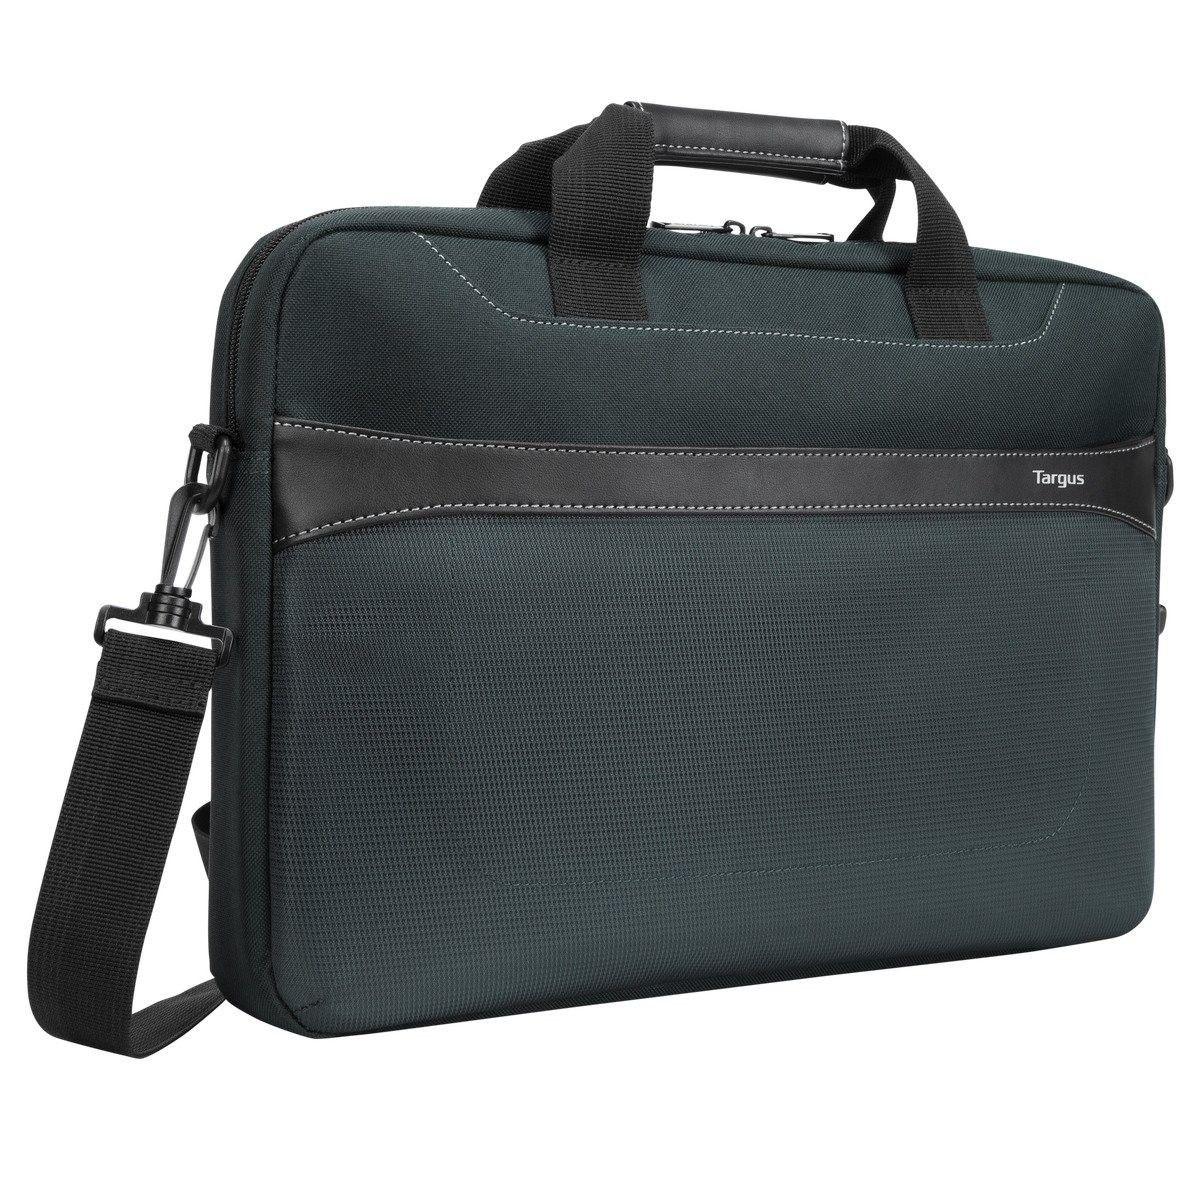 Targus Torba na laptopa Geolite Essential 15.6 czarna